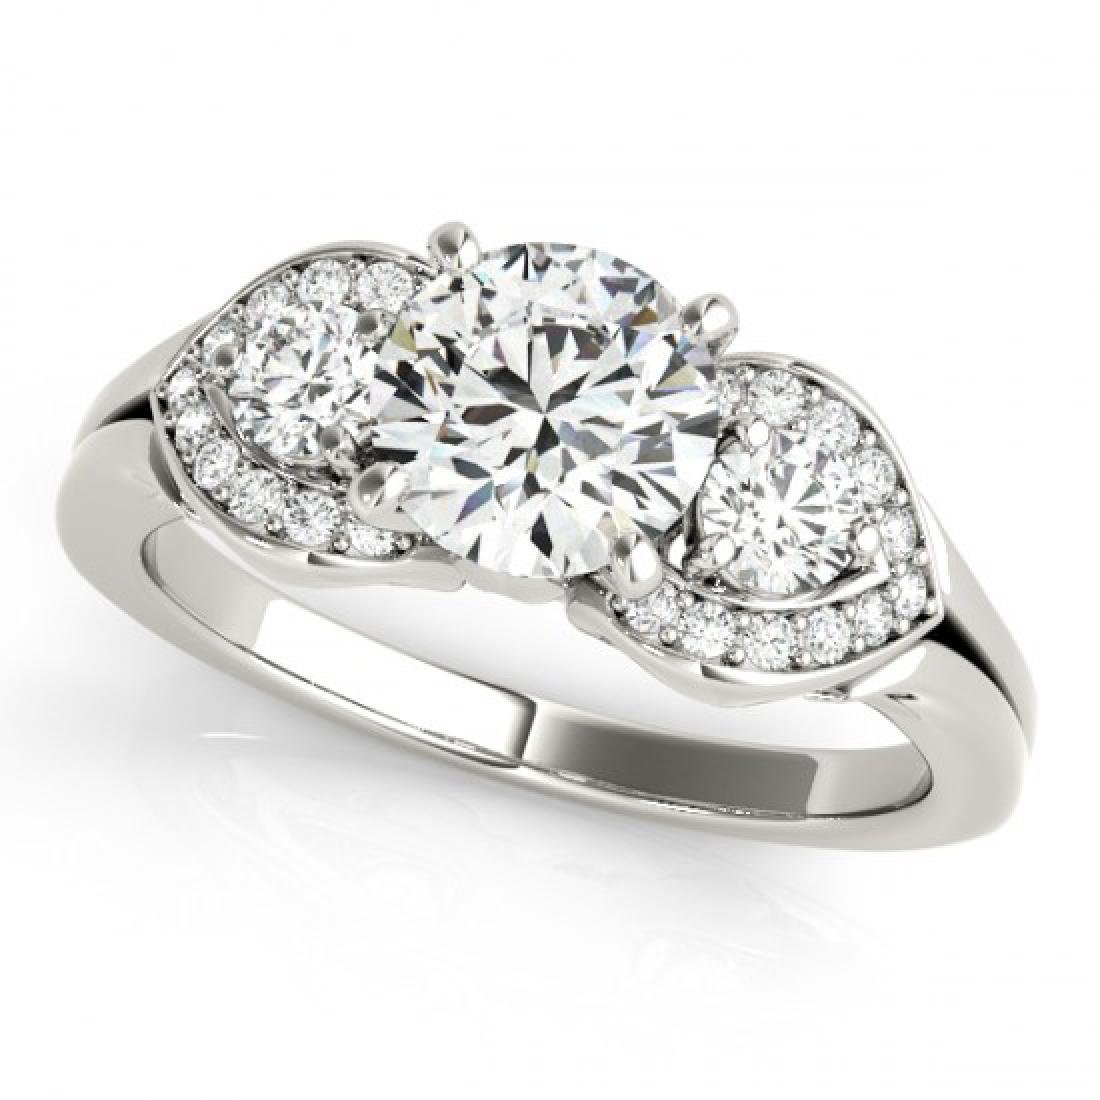 1.2 CTW Certified VS/SI Diamond 3 Stone Ring 14K White